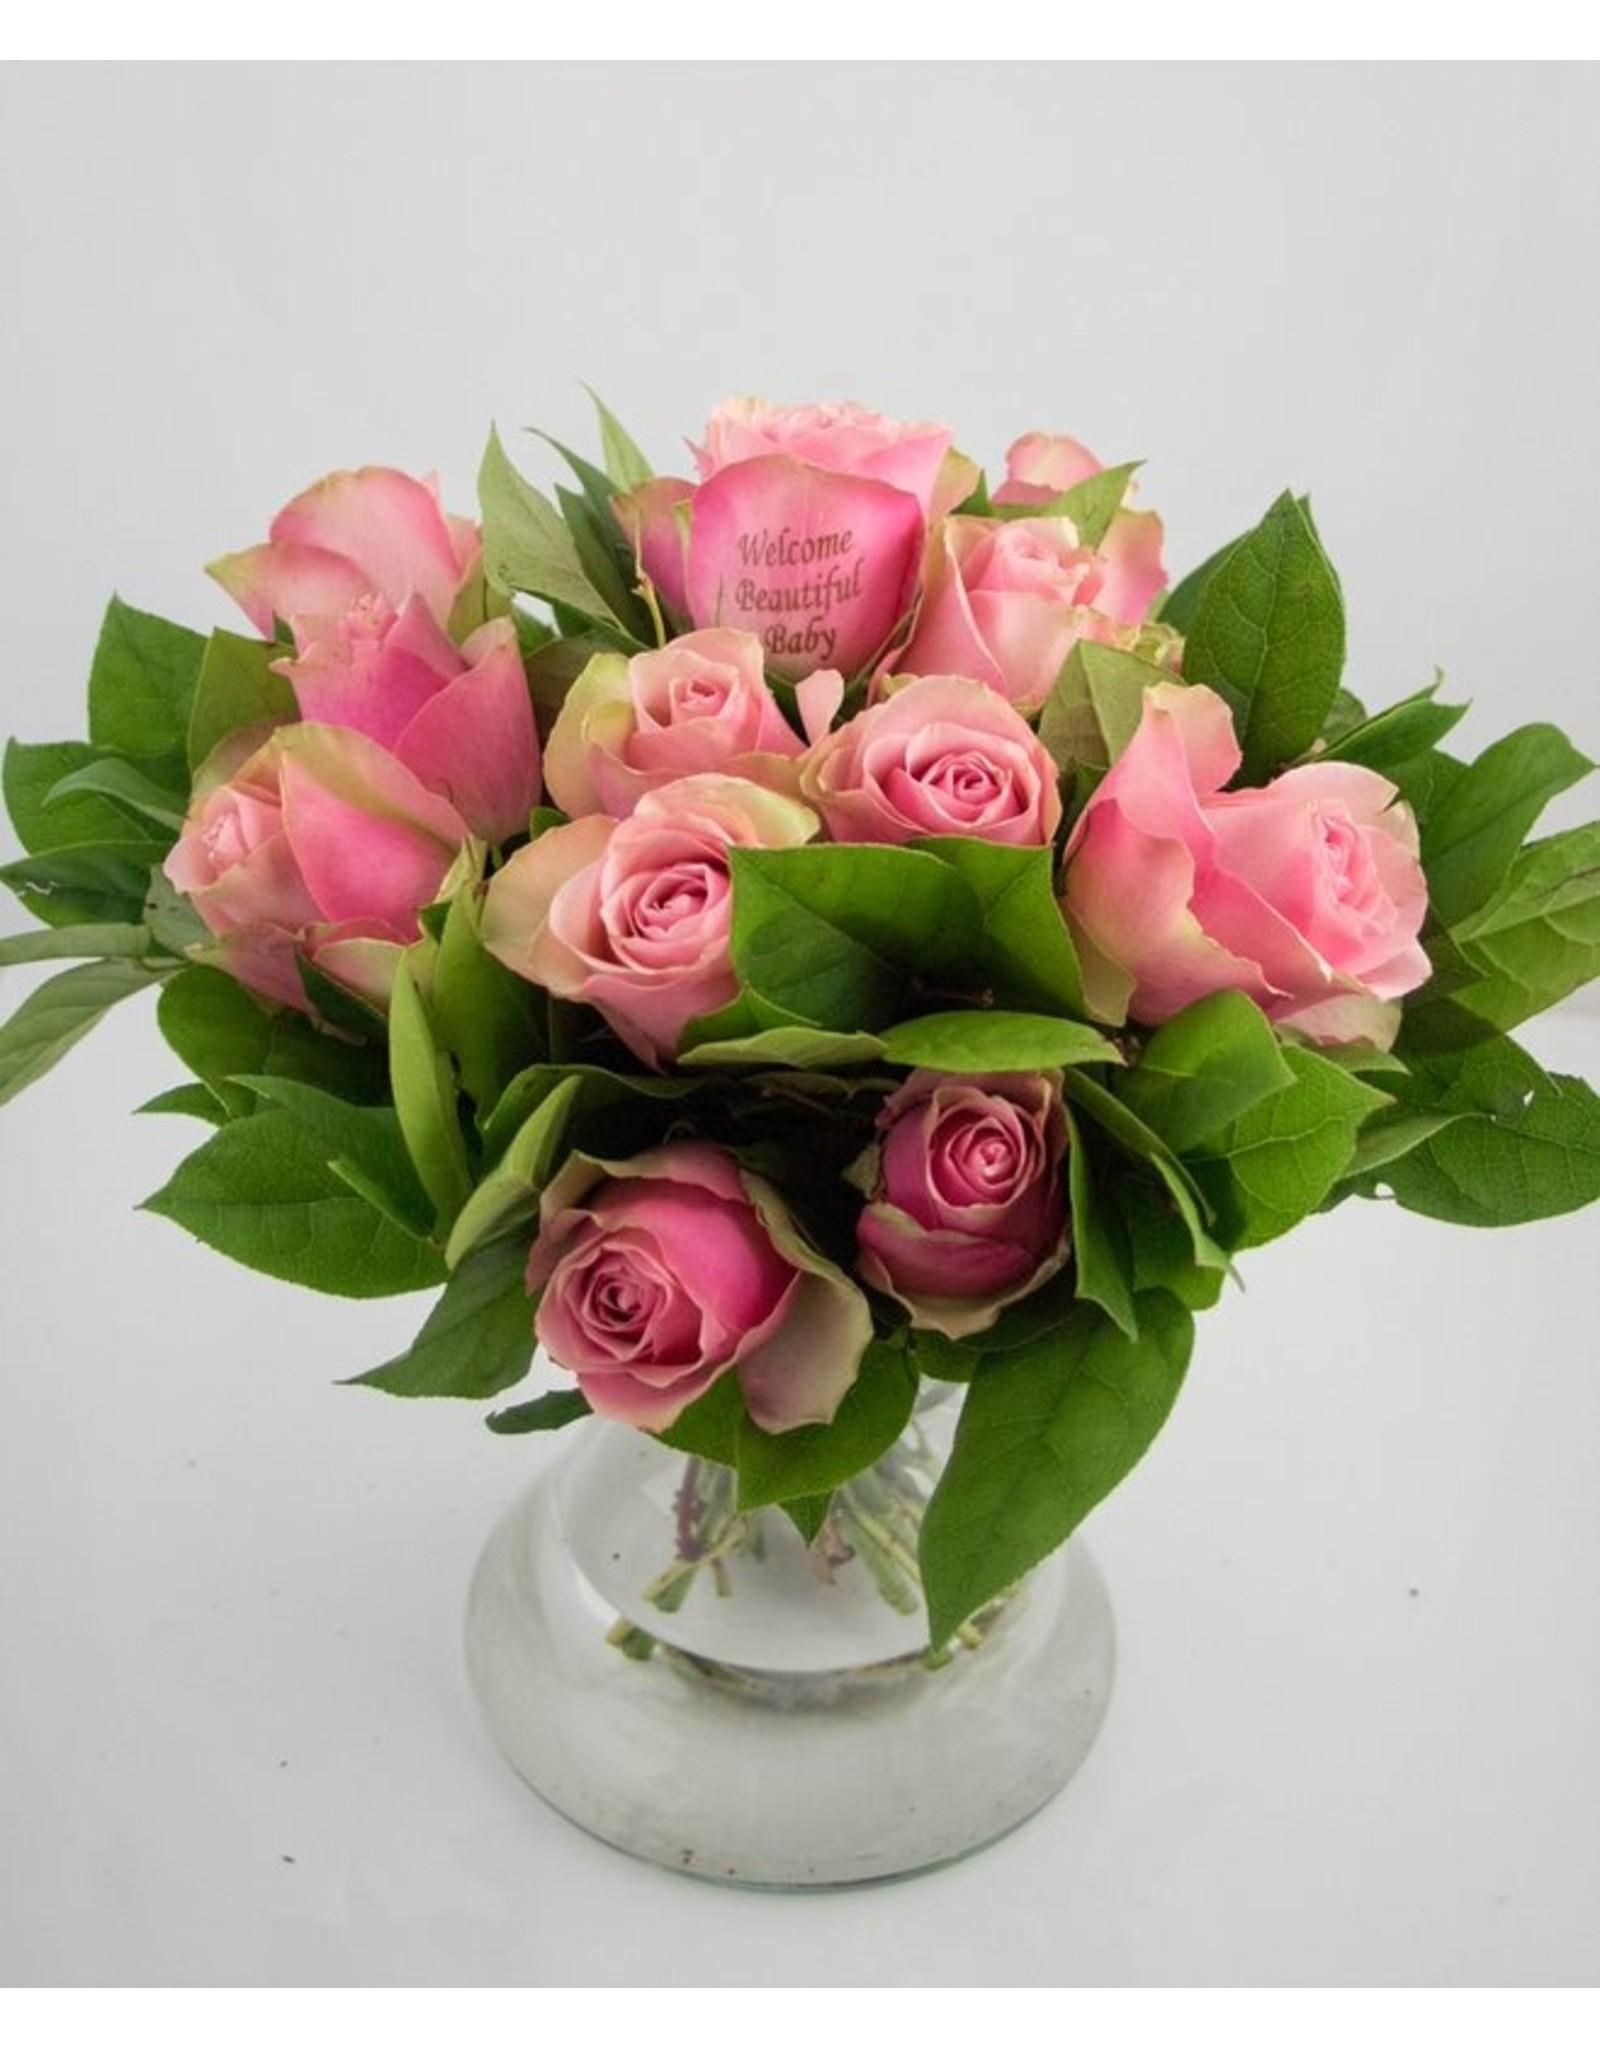 Magic Flowers Boeket 15 rozen - Roze - Welcome Beautiful Baby